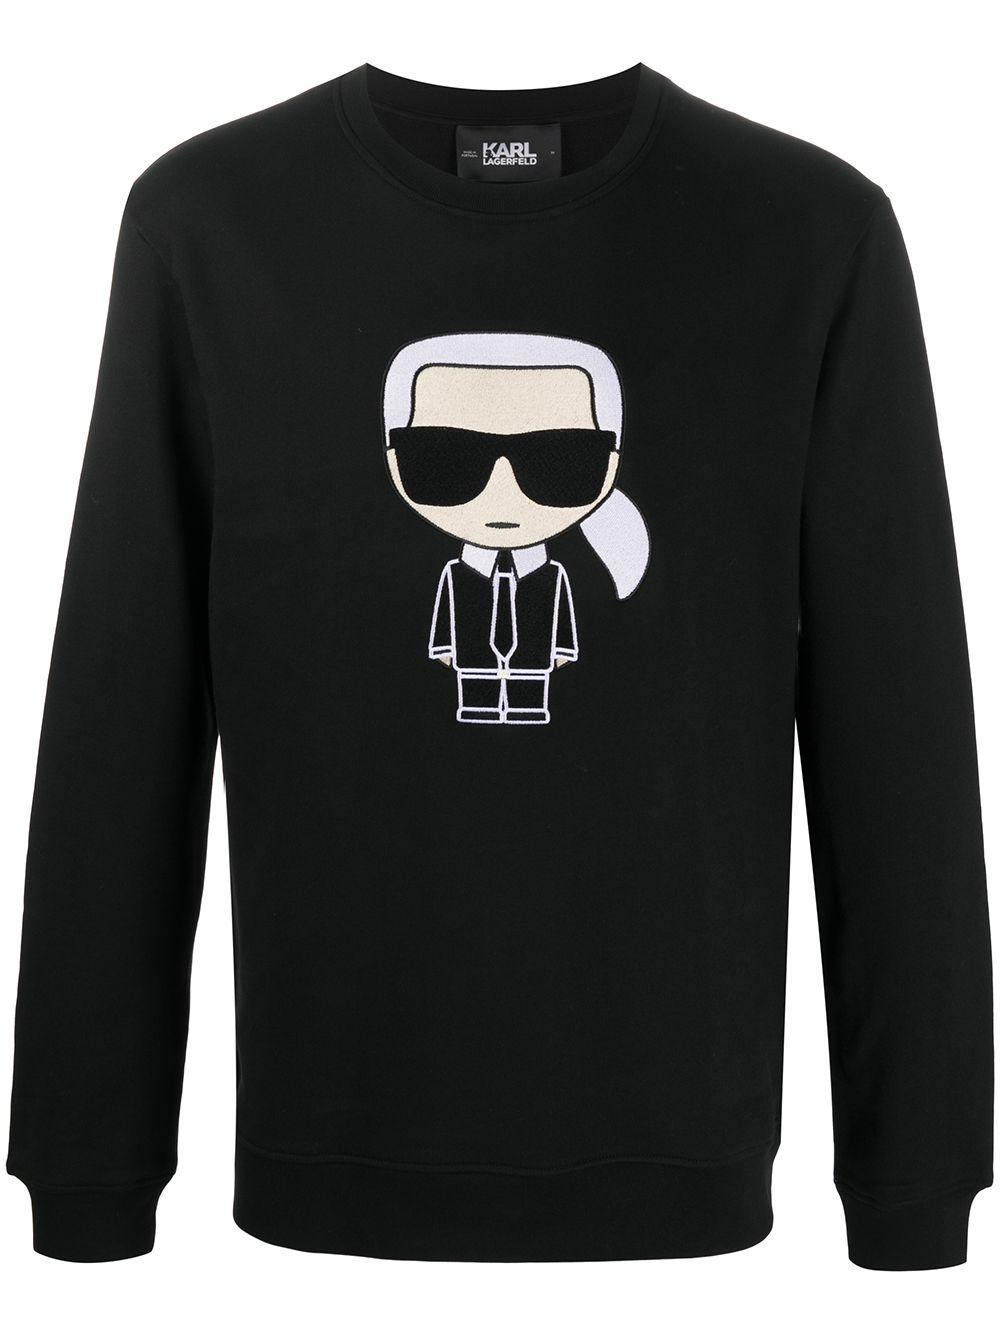 Karl Lagerfeld 'Ikonik Karl' Sweatshirt - Schwarz